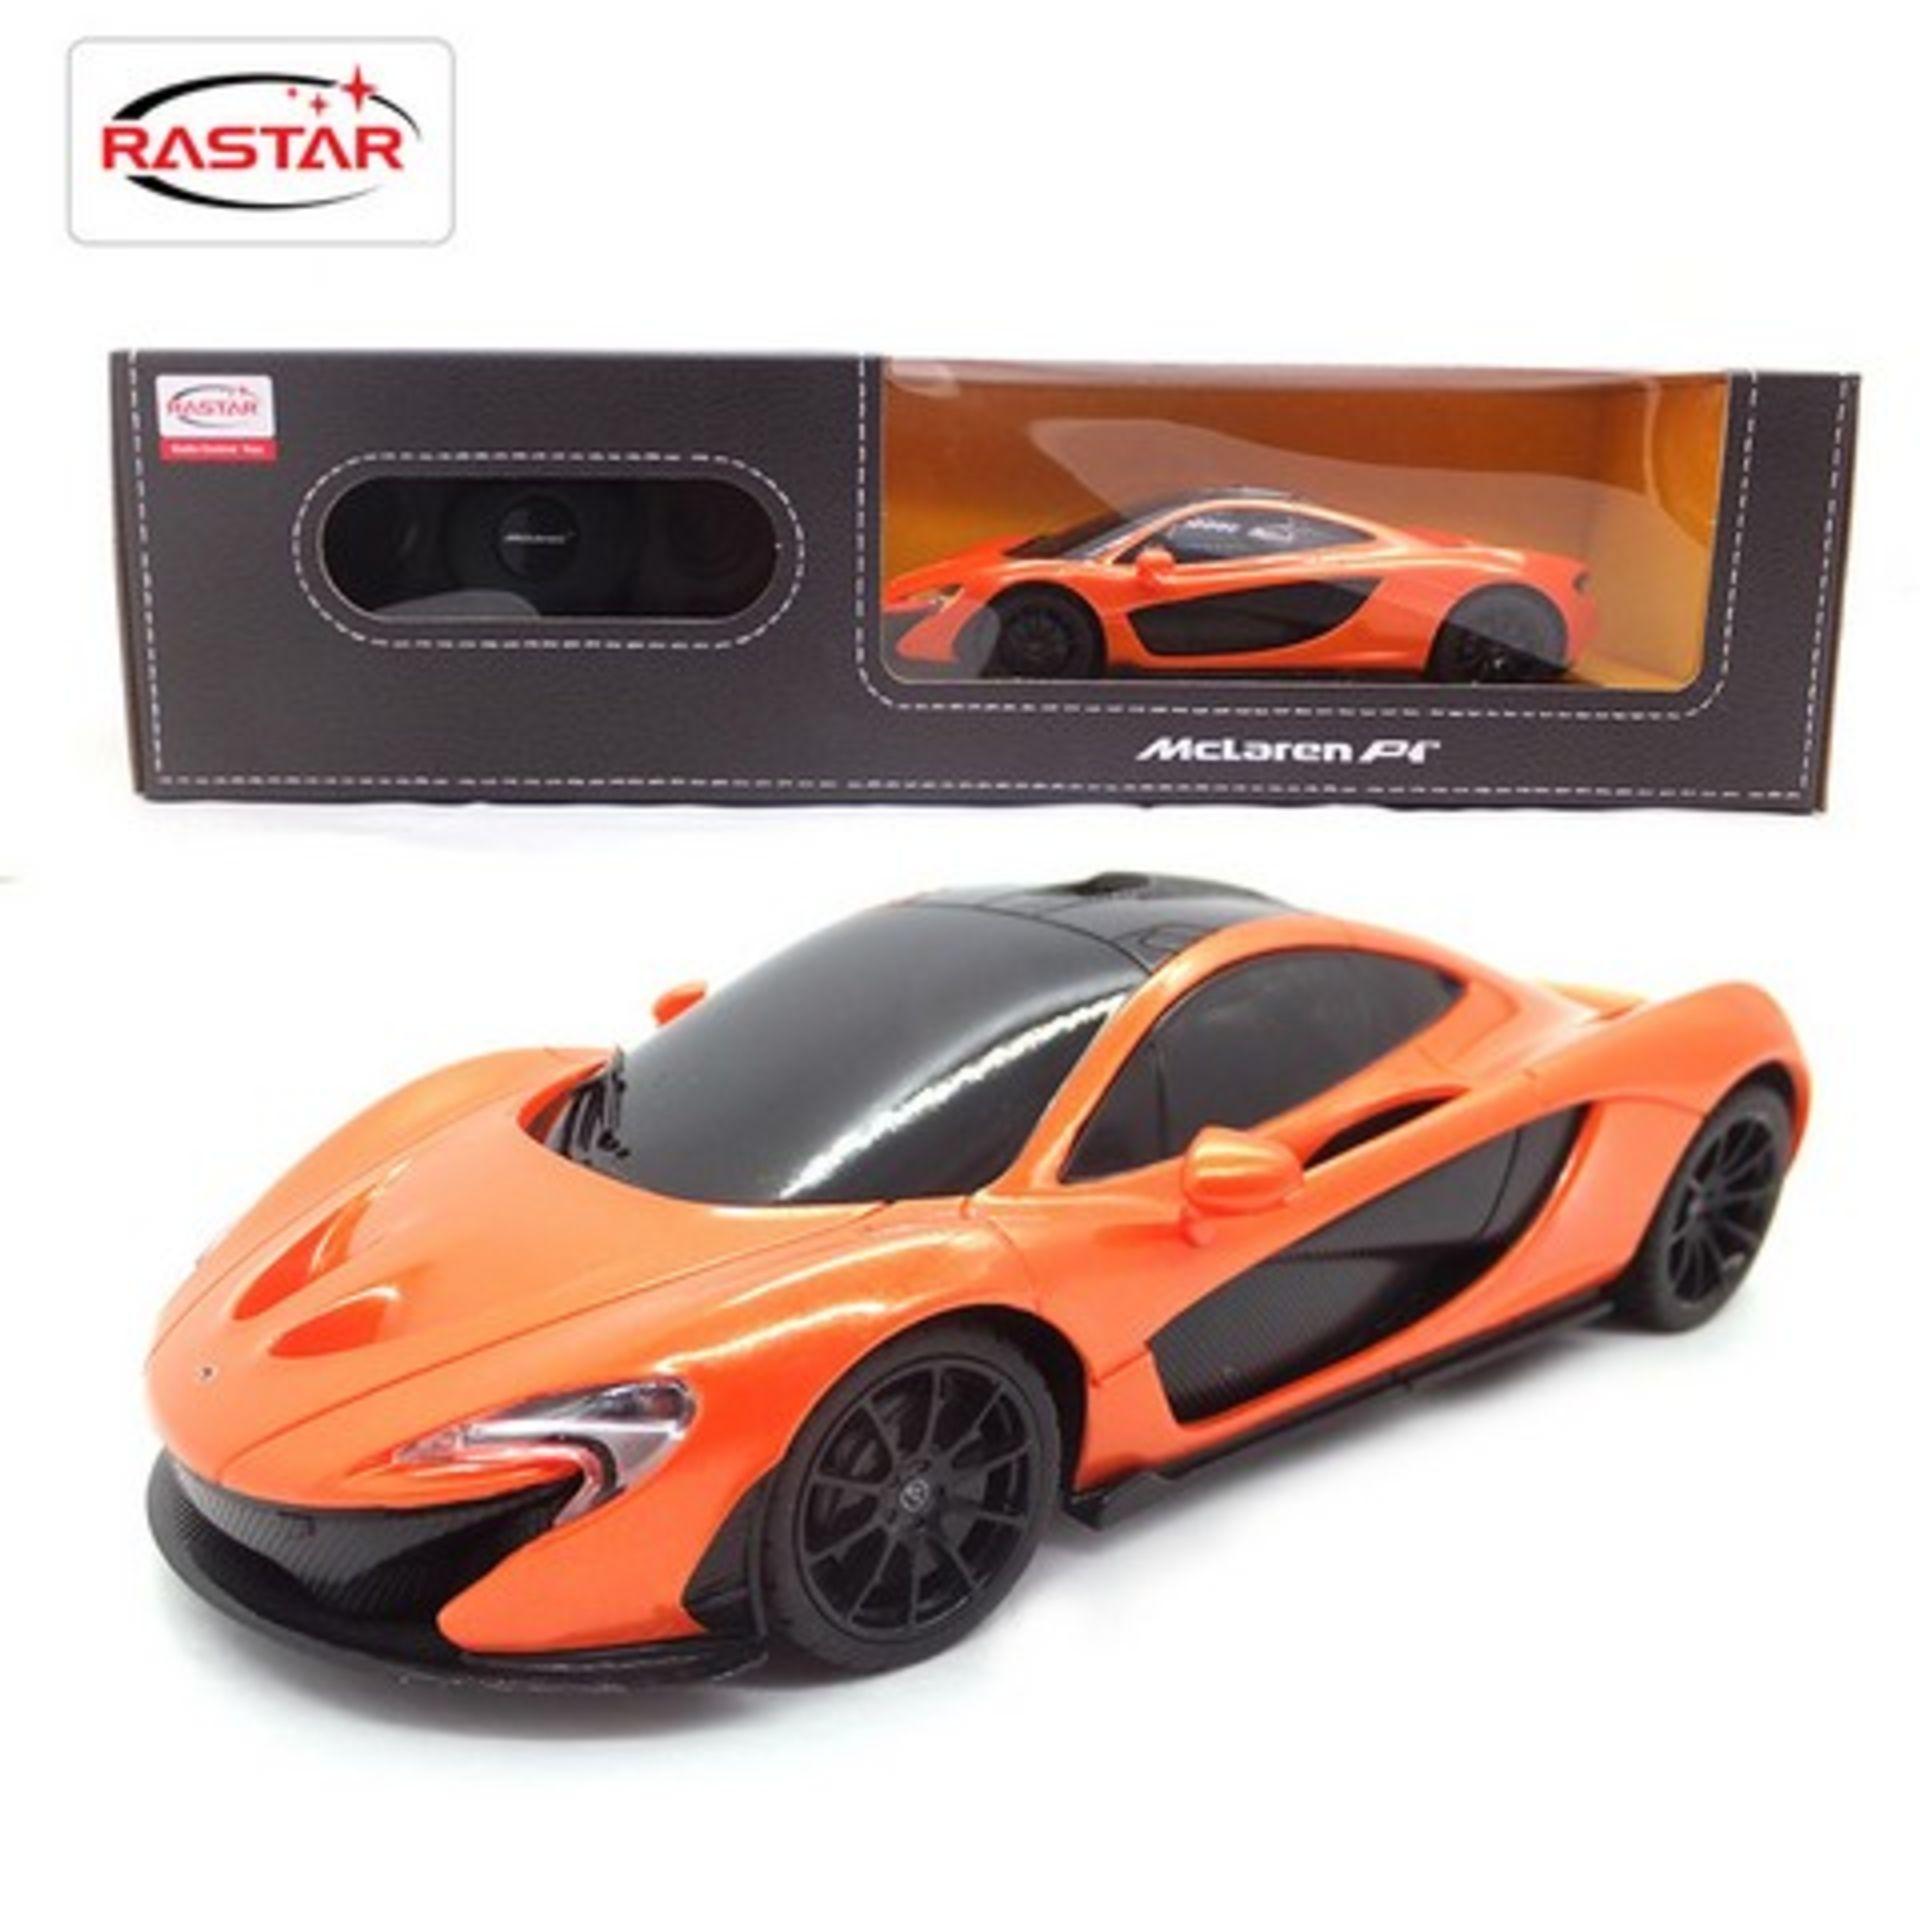 Lot 12407 - V Brand New McLaren P1 Full Function Radio Controlled Car - ISP £22.99 (Amazon) Similar Product